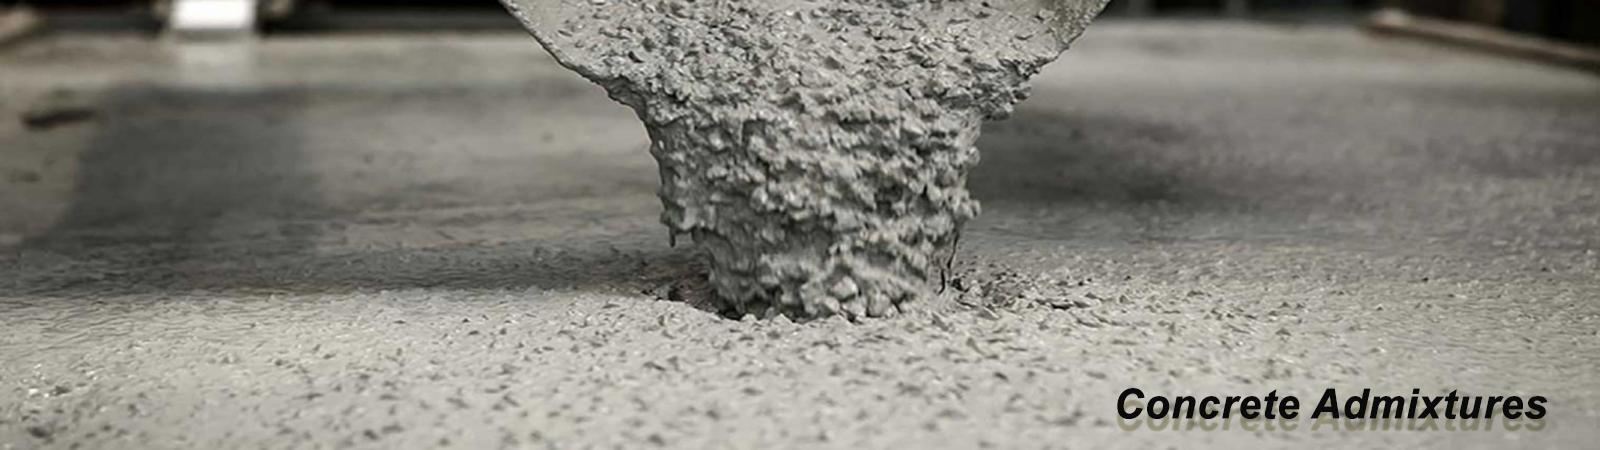 Concrete Admixtures, www.hibond.in